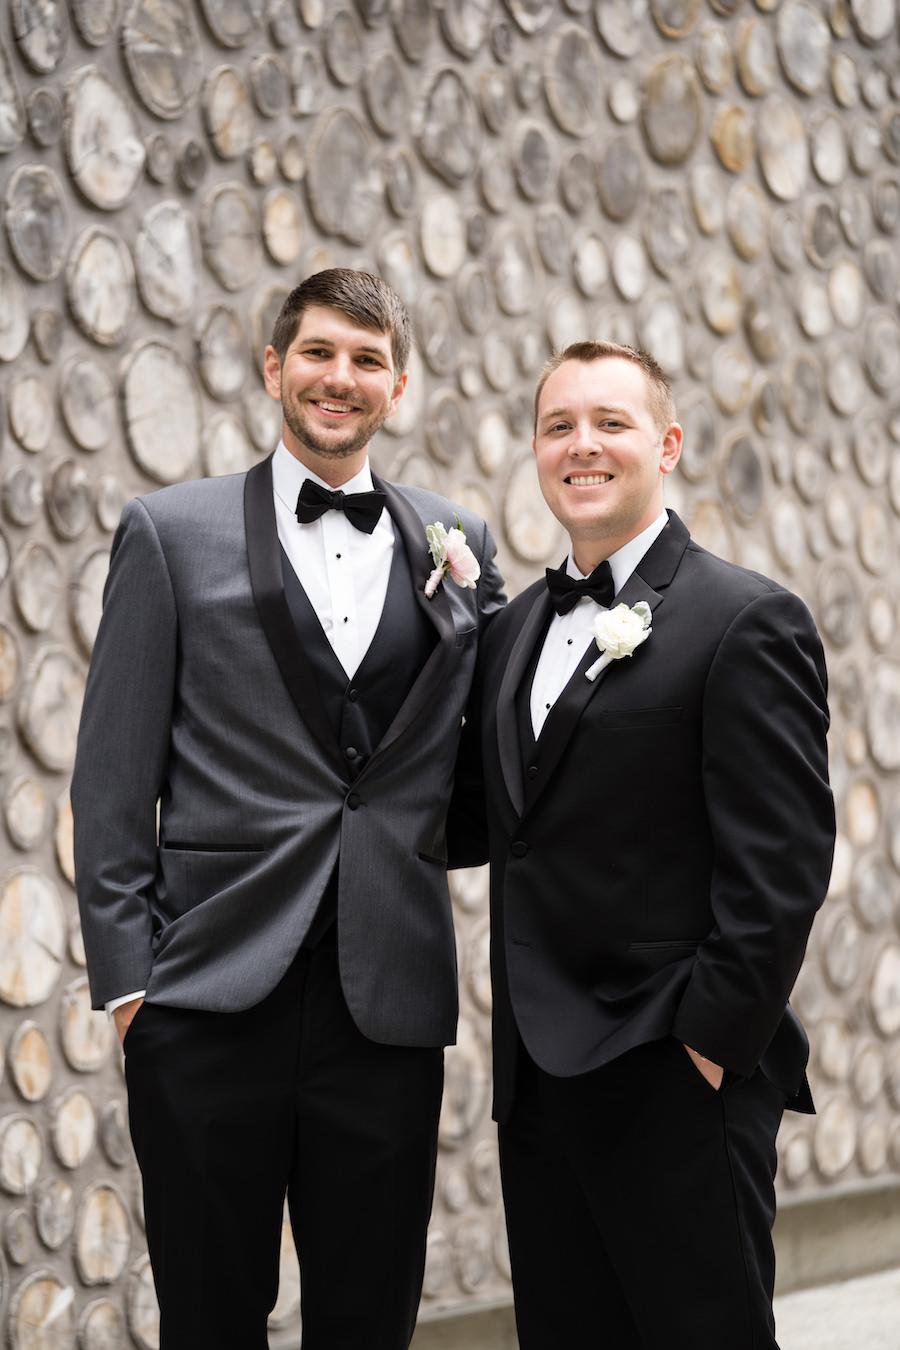 A groom and groomsman smiling before his Kalamazoo, Michigan wedding